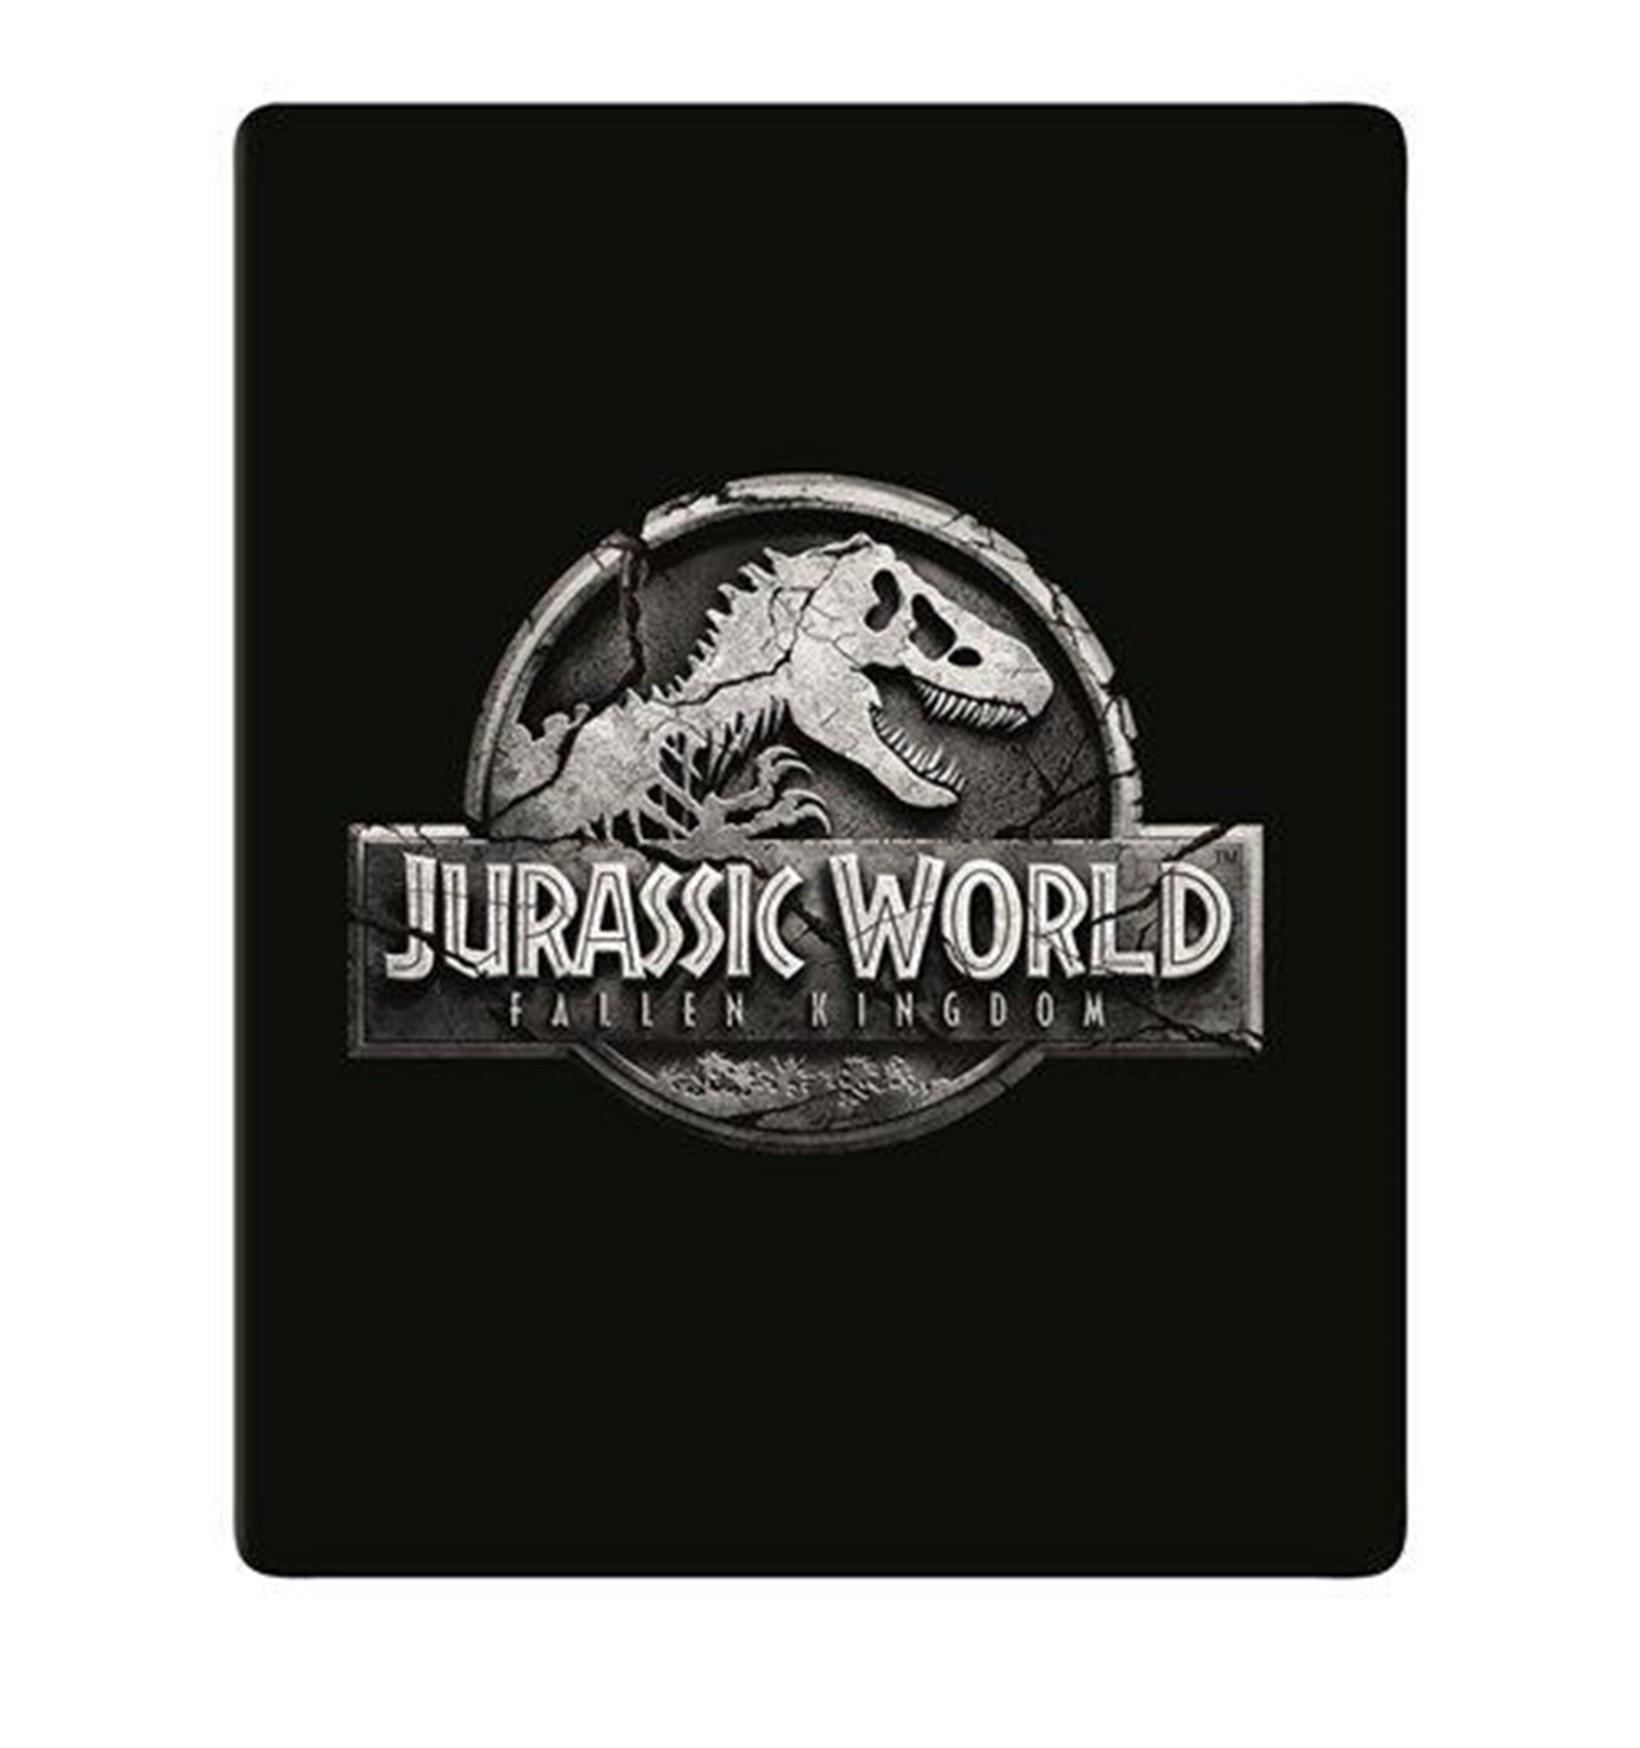 Jurassic World - Fallen Kingdom (hmv Exclusive) 4K Ultra HD Steelbook